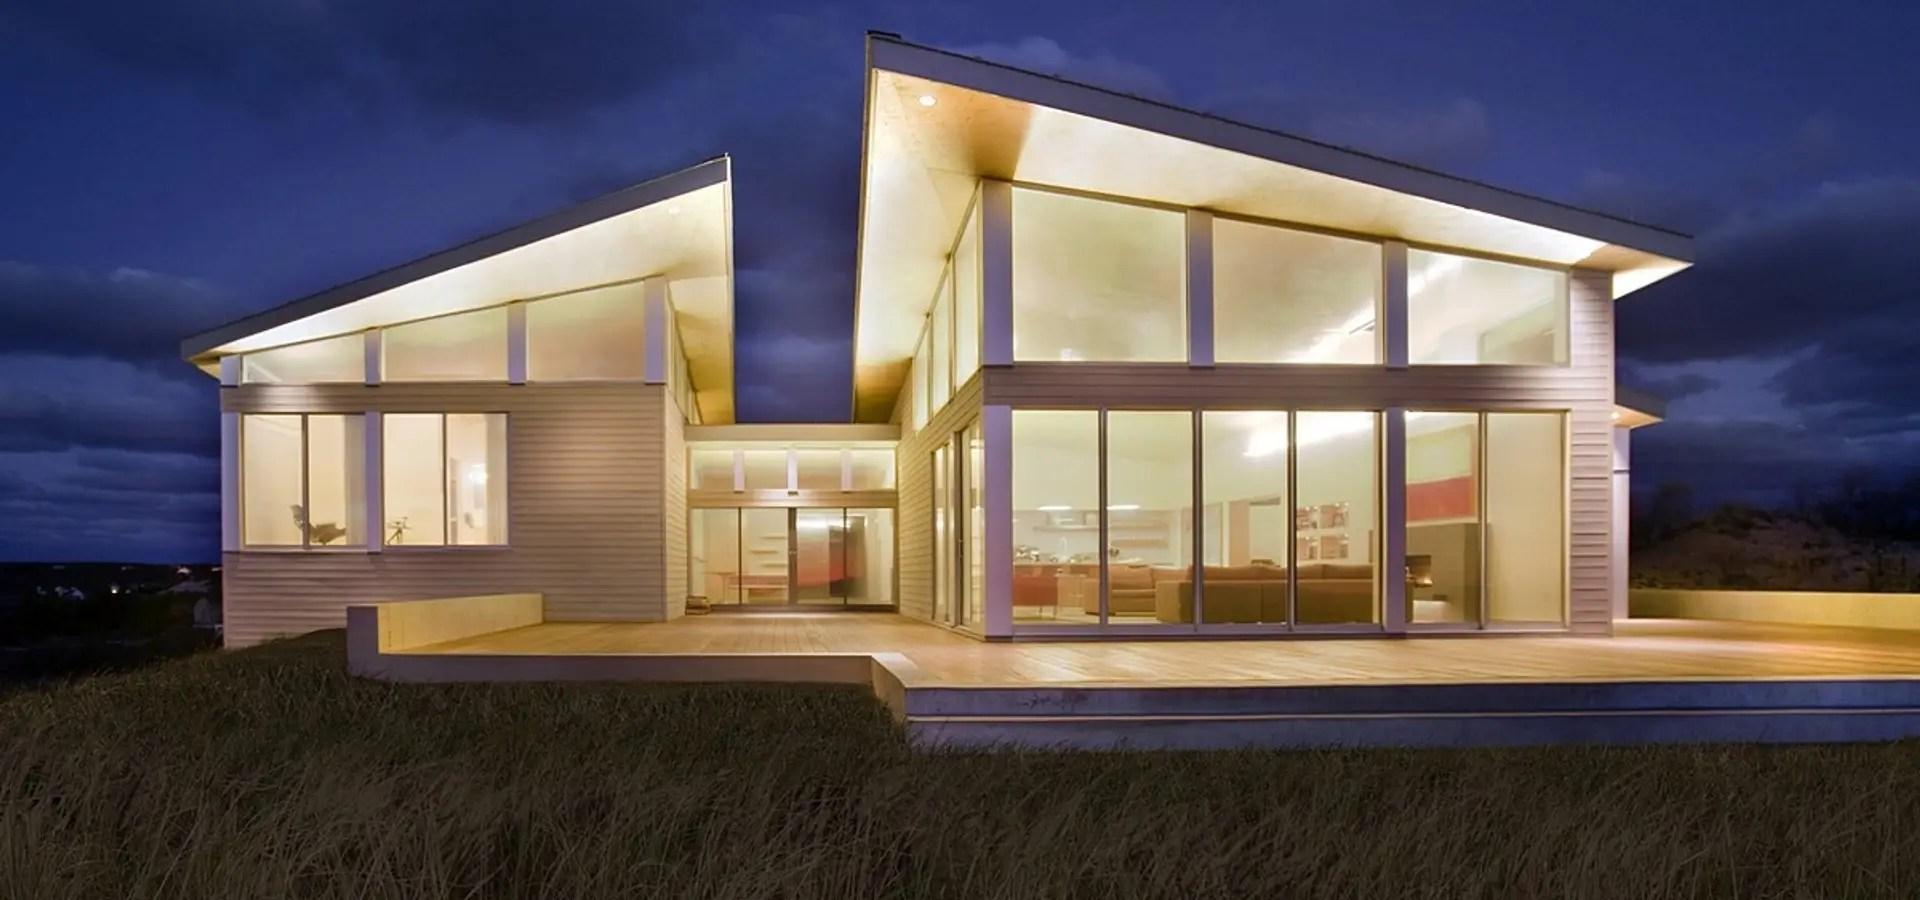 Best Kitchen Gallery: Truro Modern Beach House By Zeroenergy Design Homify of Modern Beach House on rachelxblog.com